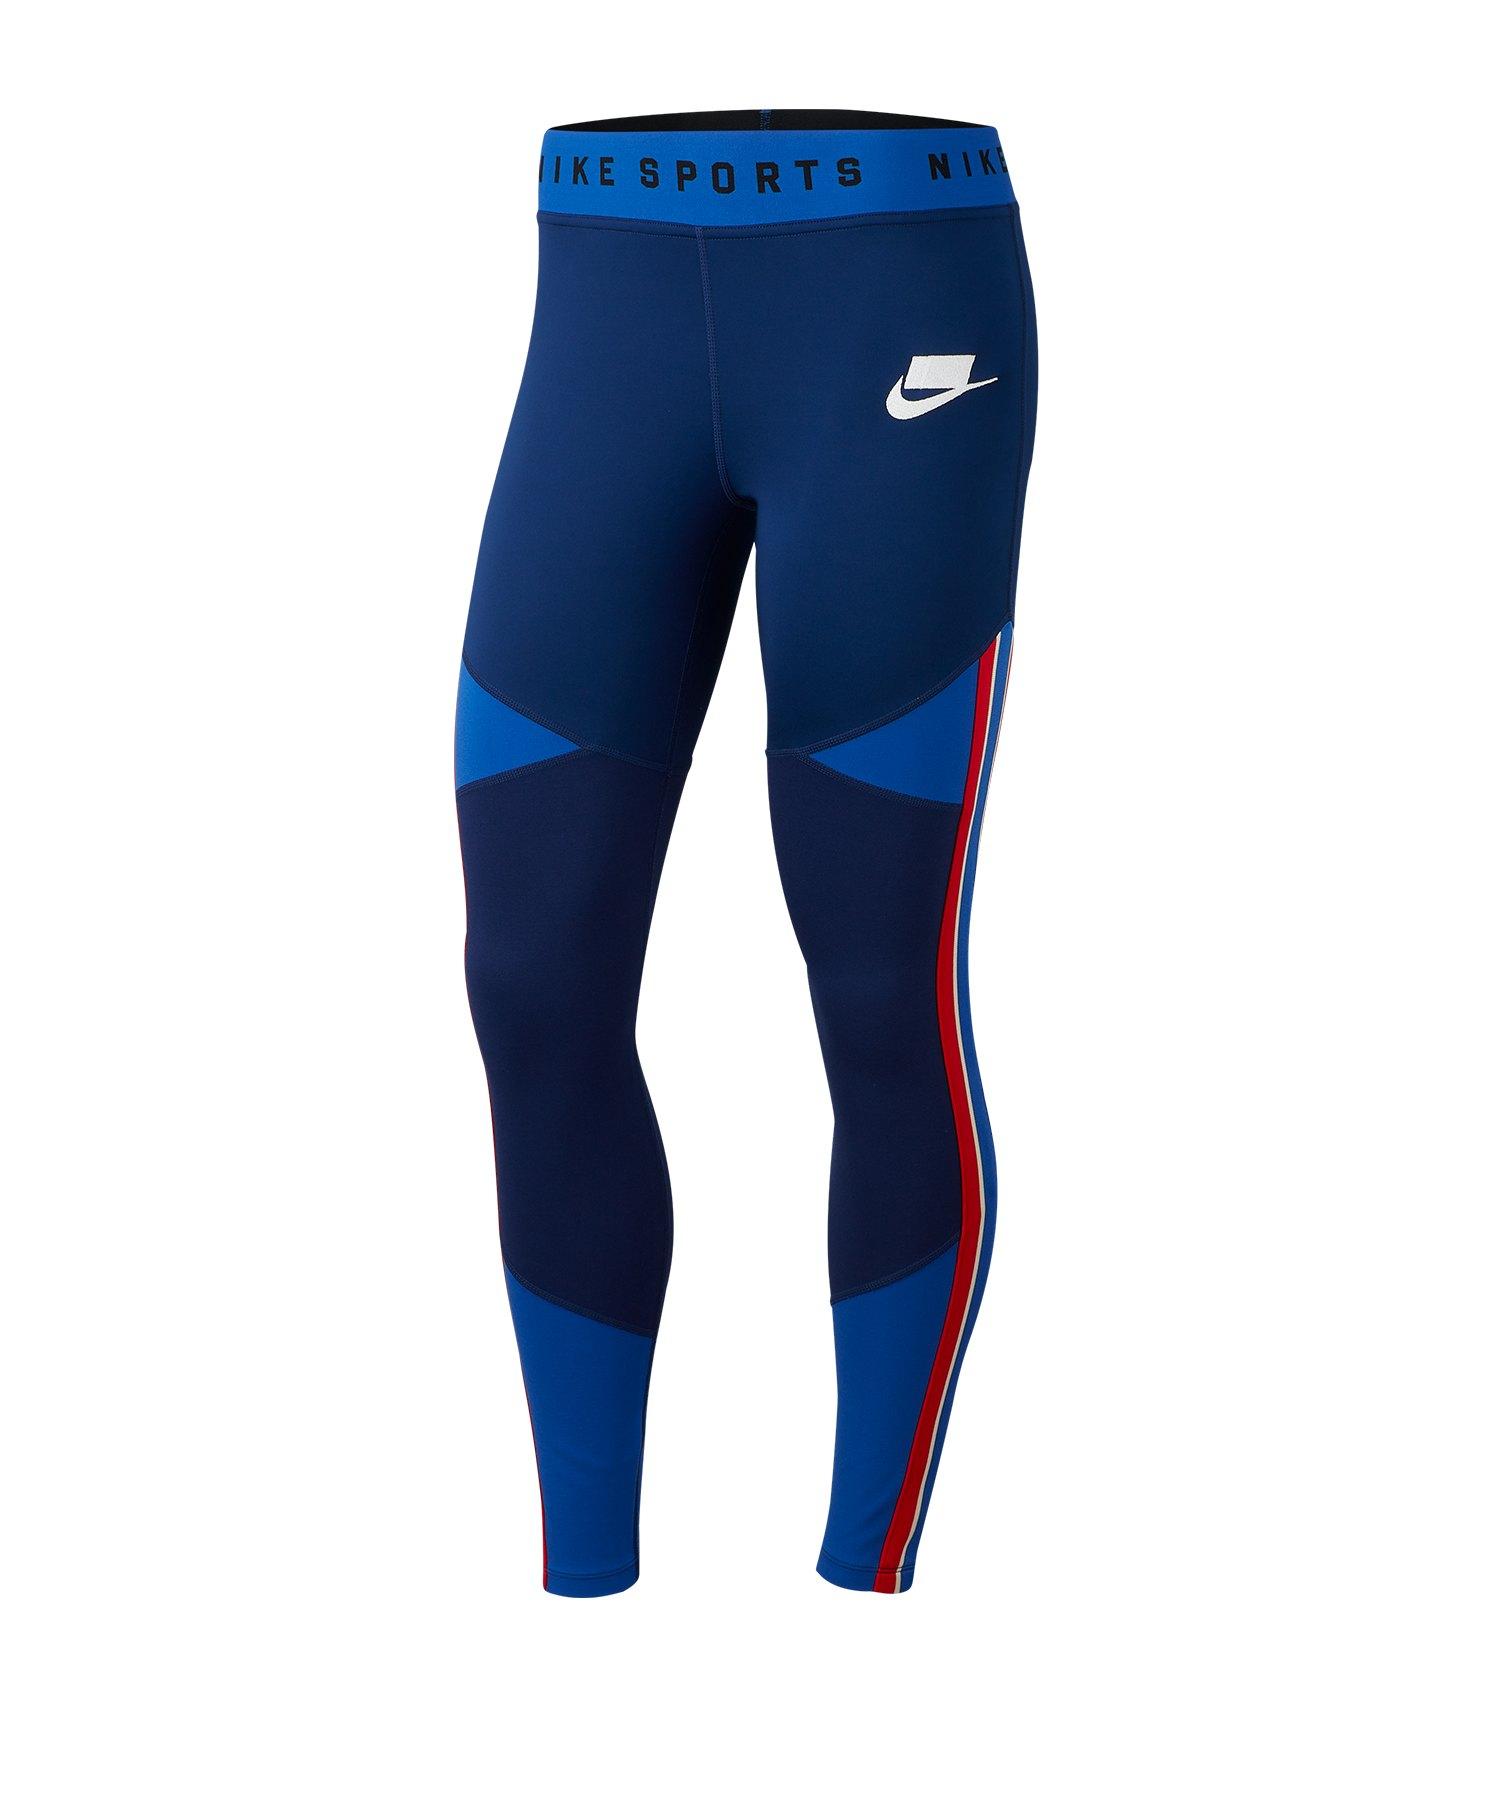 Nike Graphic Legging Damen Blau F492 - blau